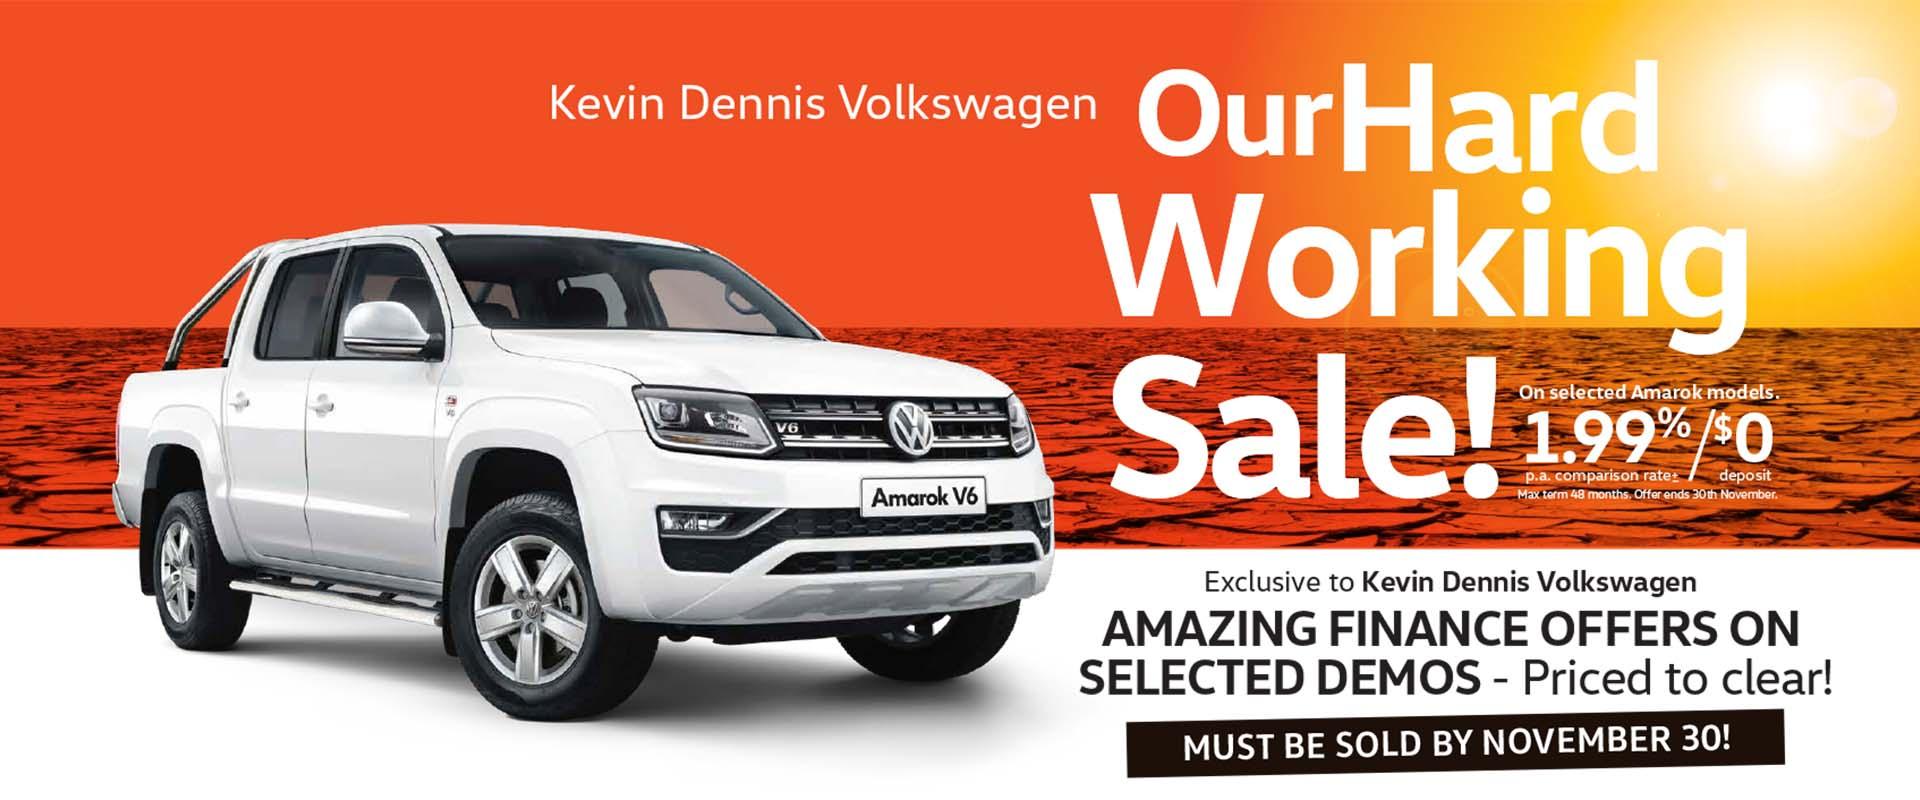 Kevin Dennis VW Our Hard Working Sale